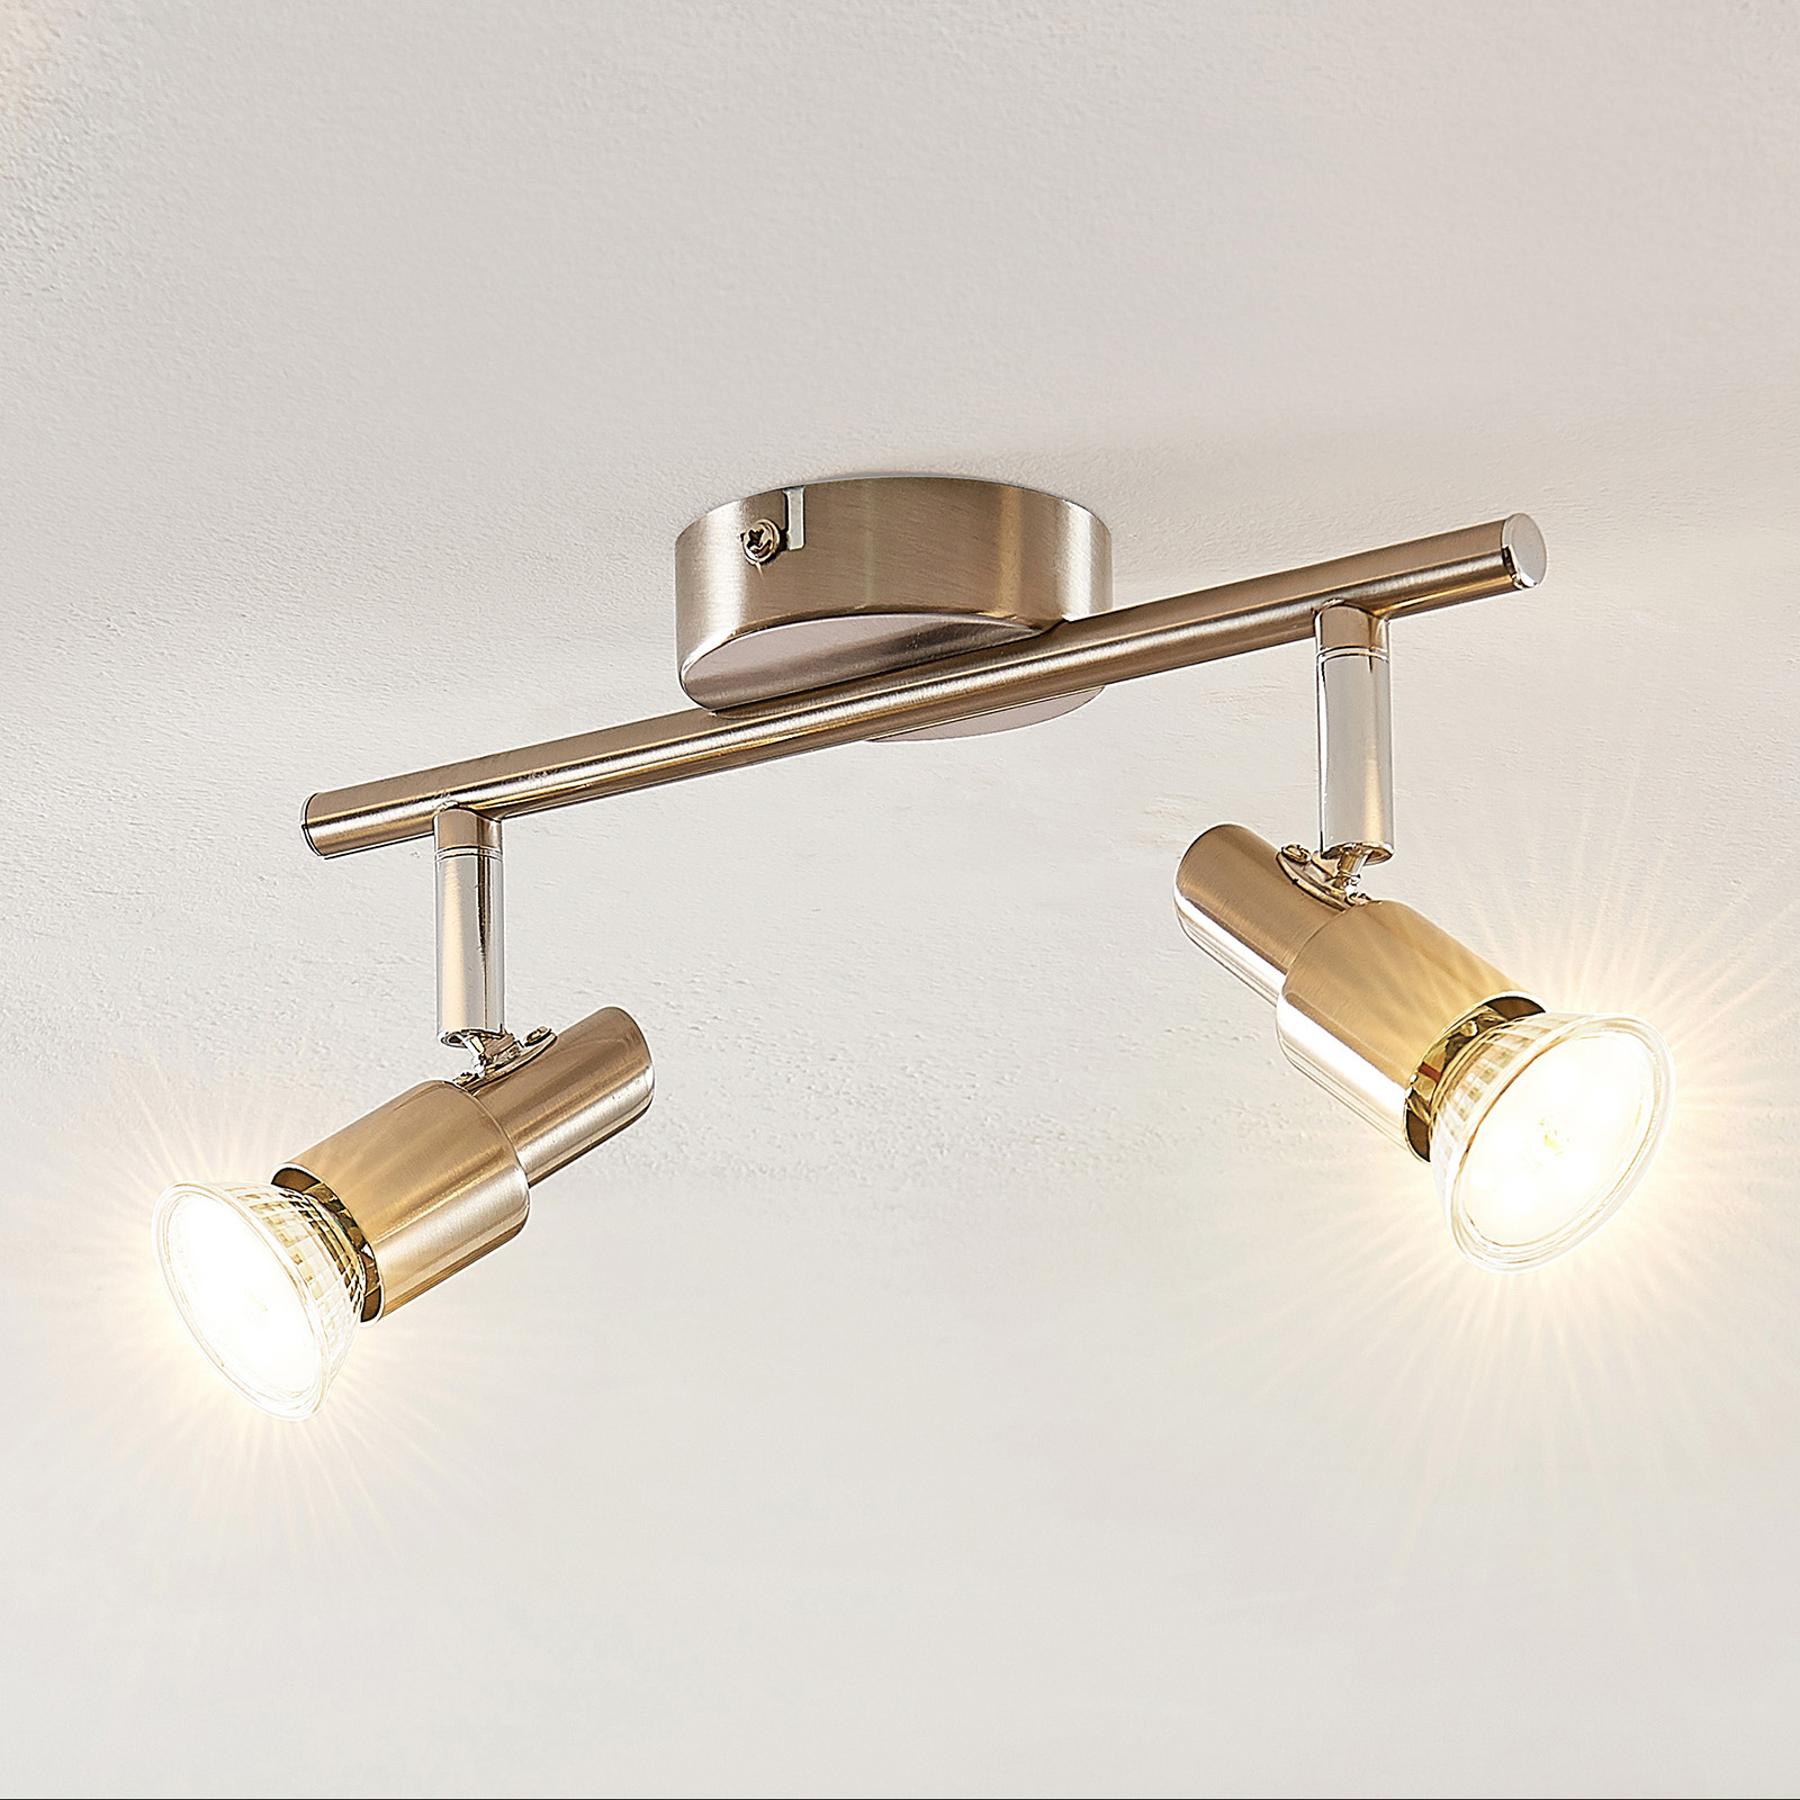 ELC Farida -LED-kohdevalo, nikkeli, 2-lamp.